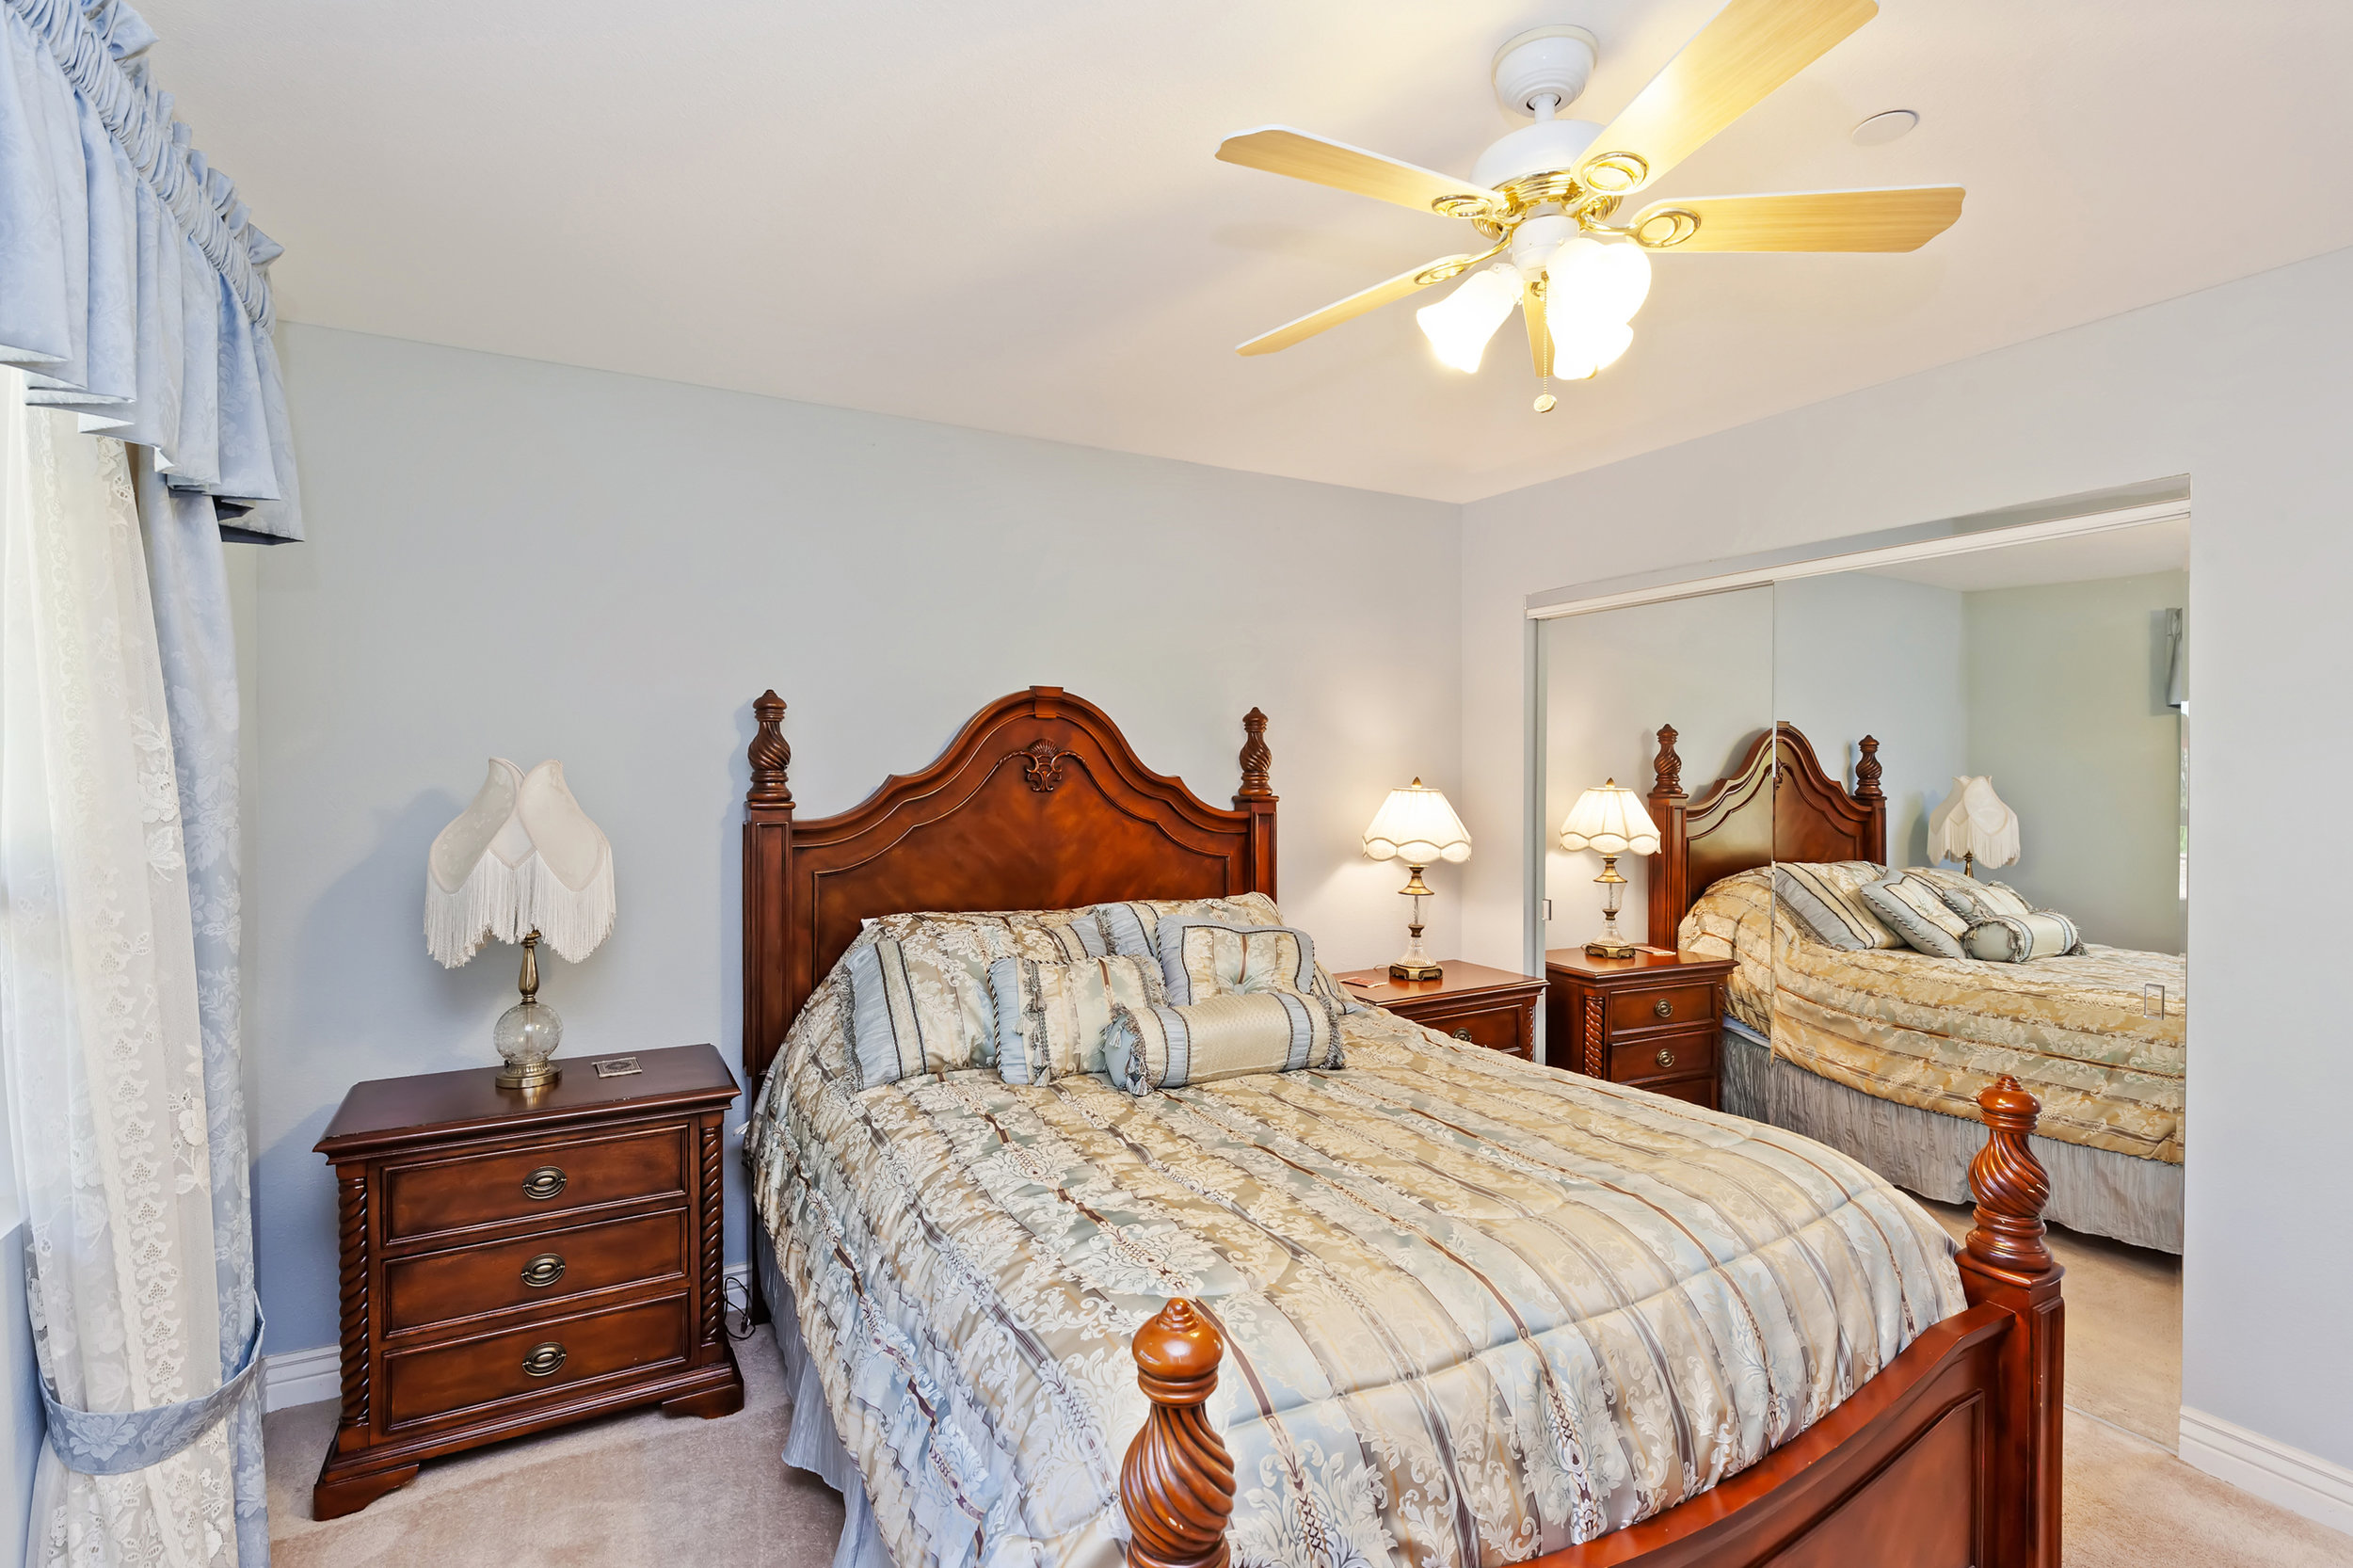 043_Bedroom 3.jpg